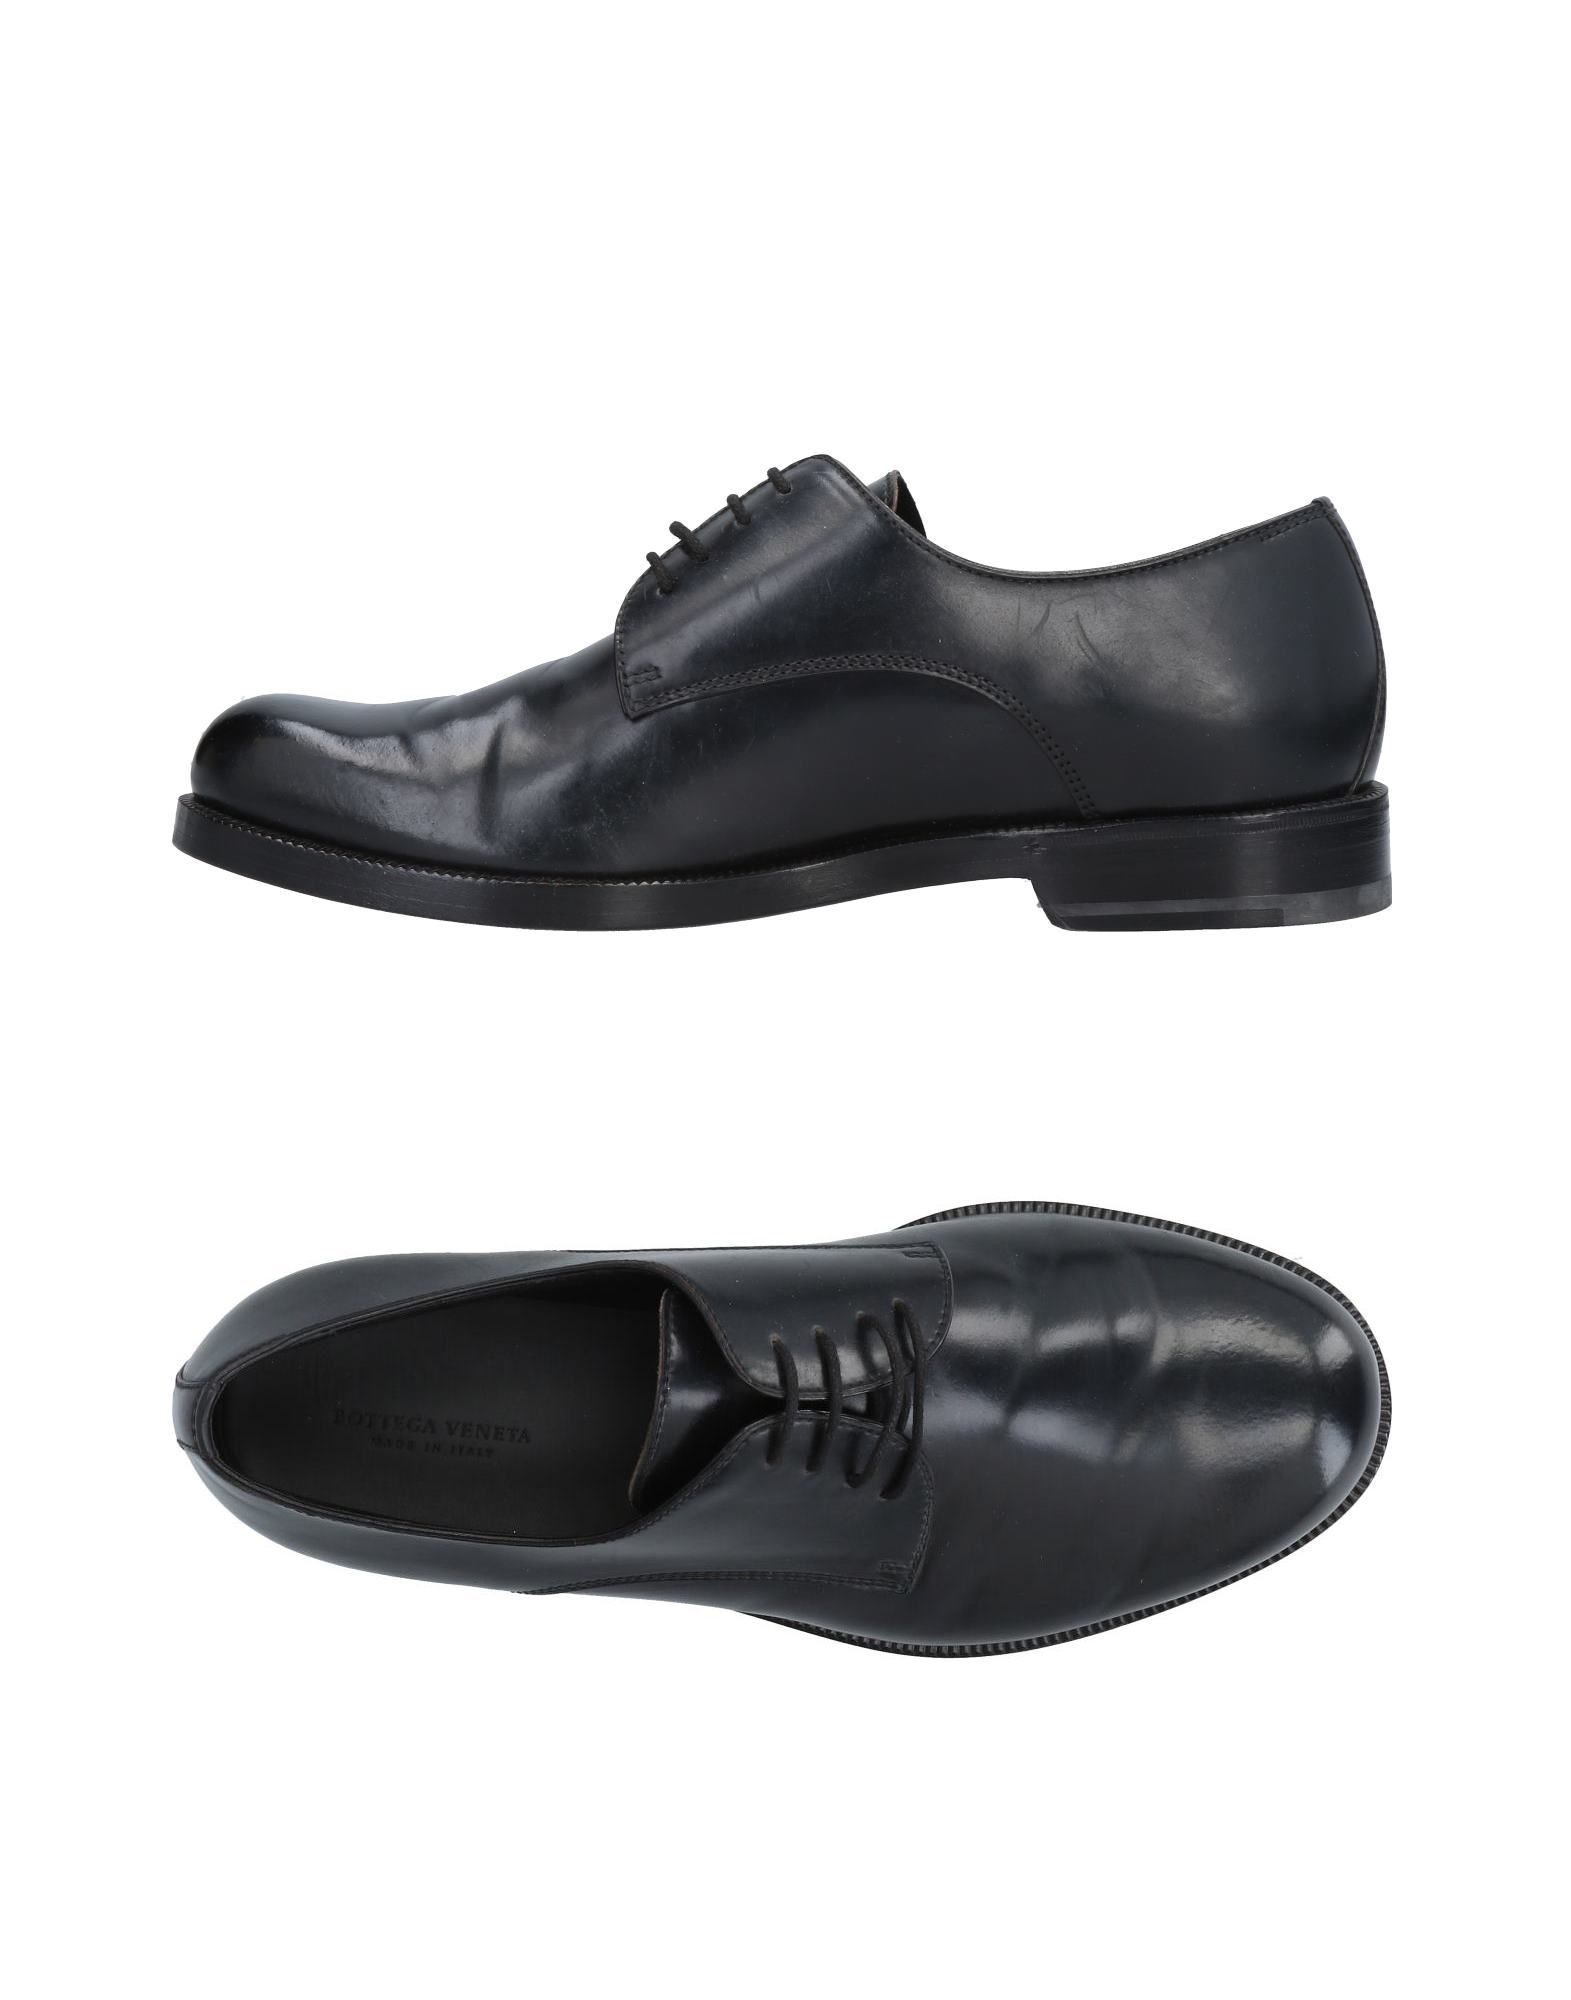 Bottega Veneta Schnürschuhe Herren  11489906NN Gute Qualität beliebte Schuhe